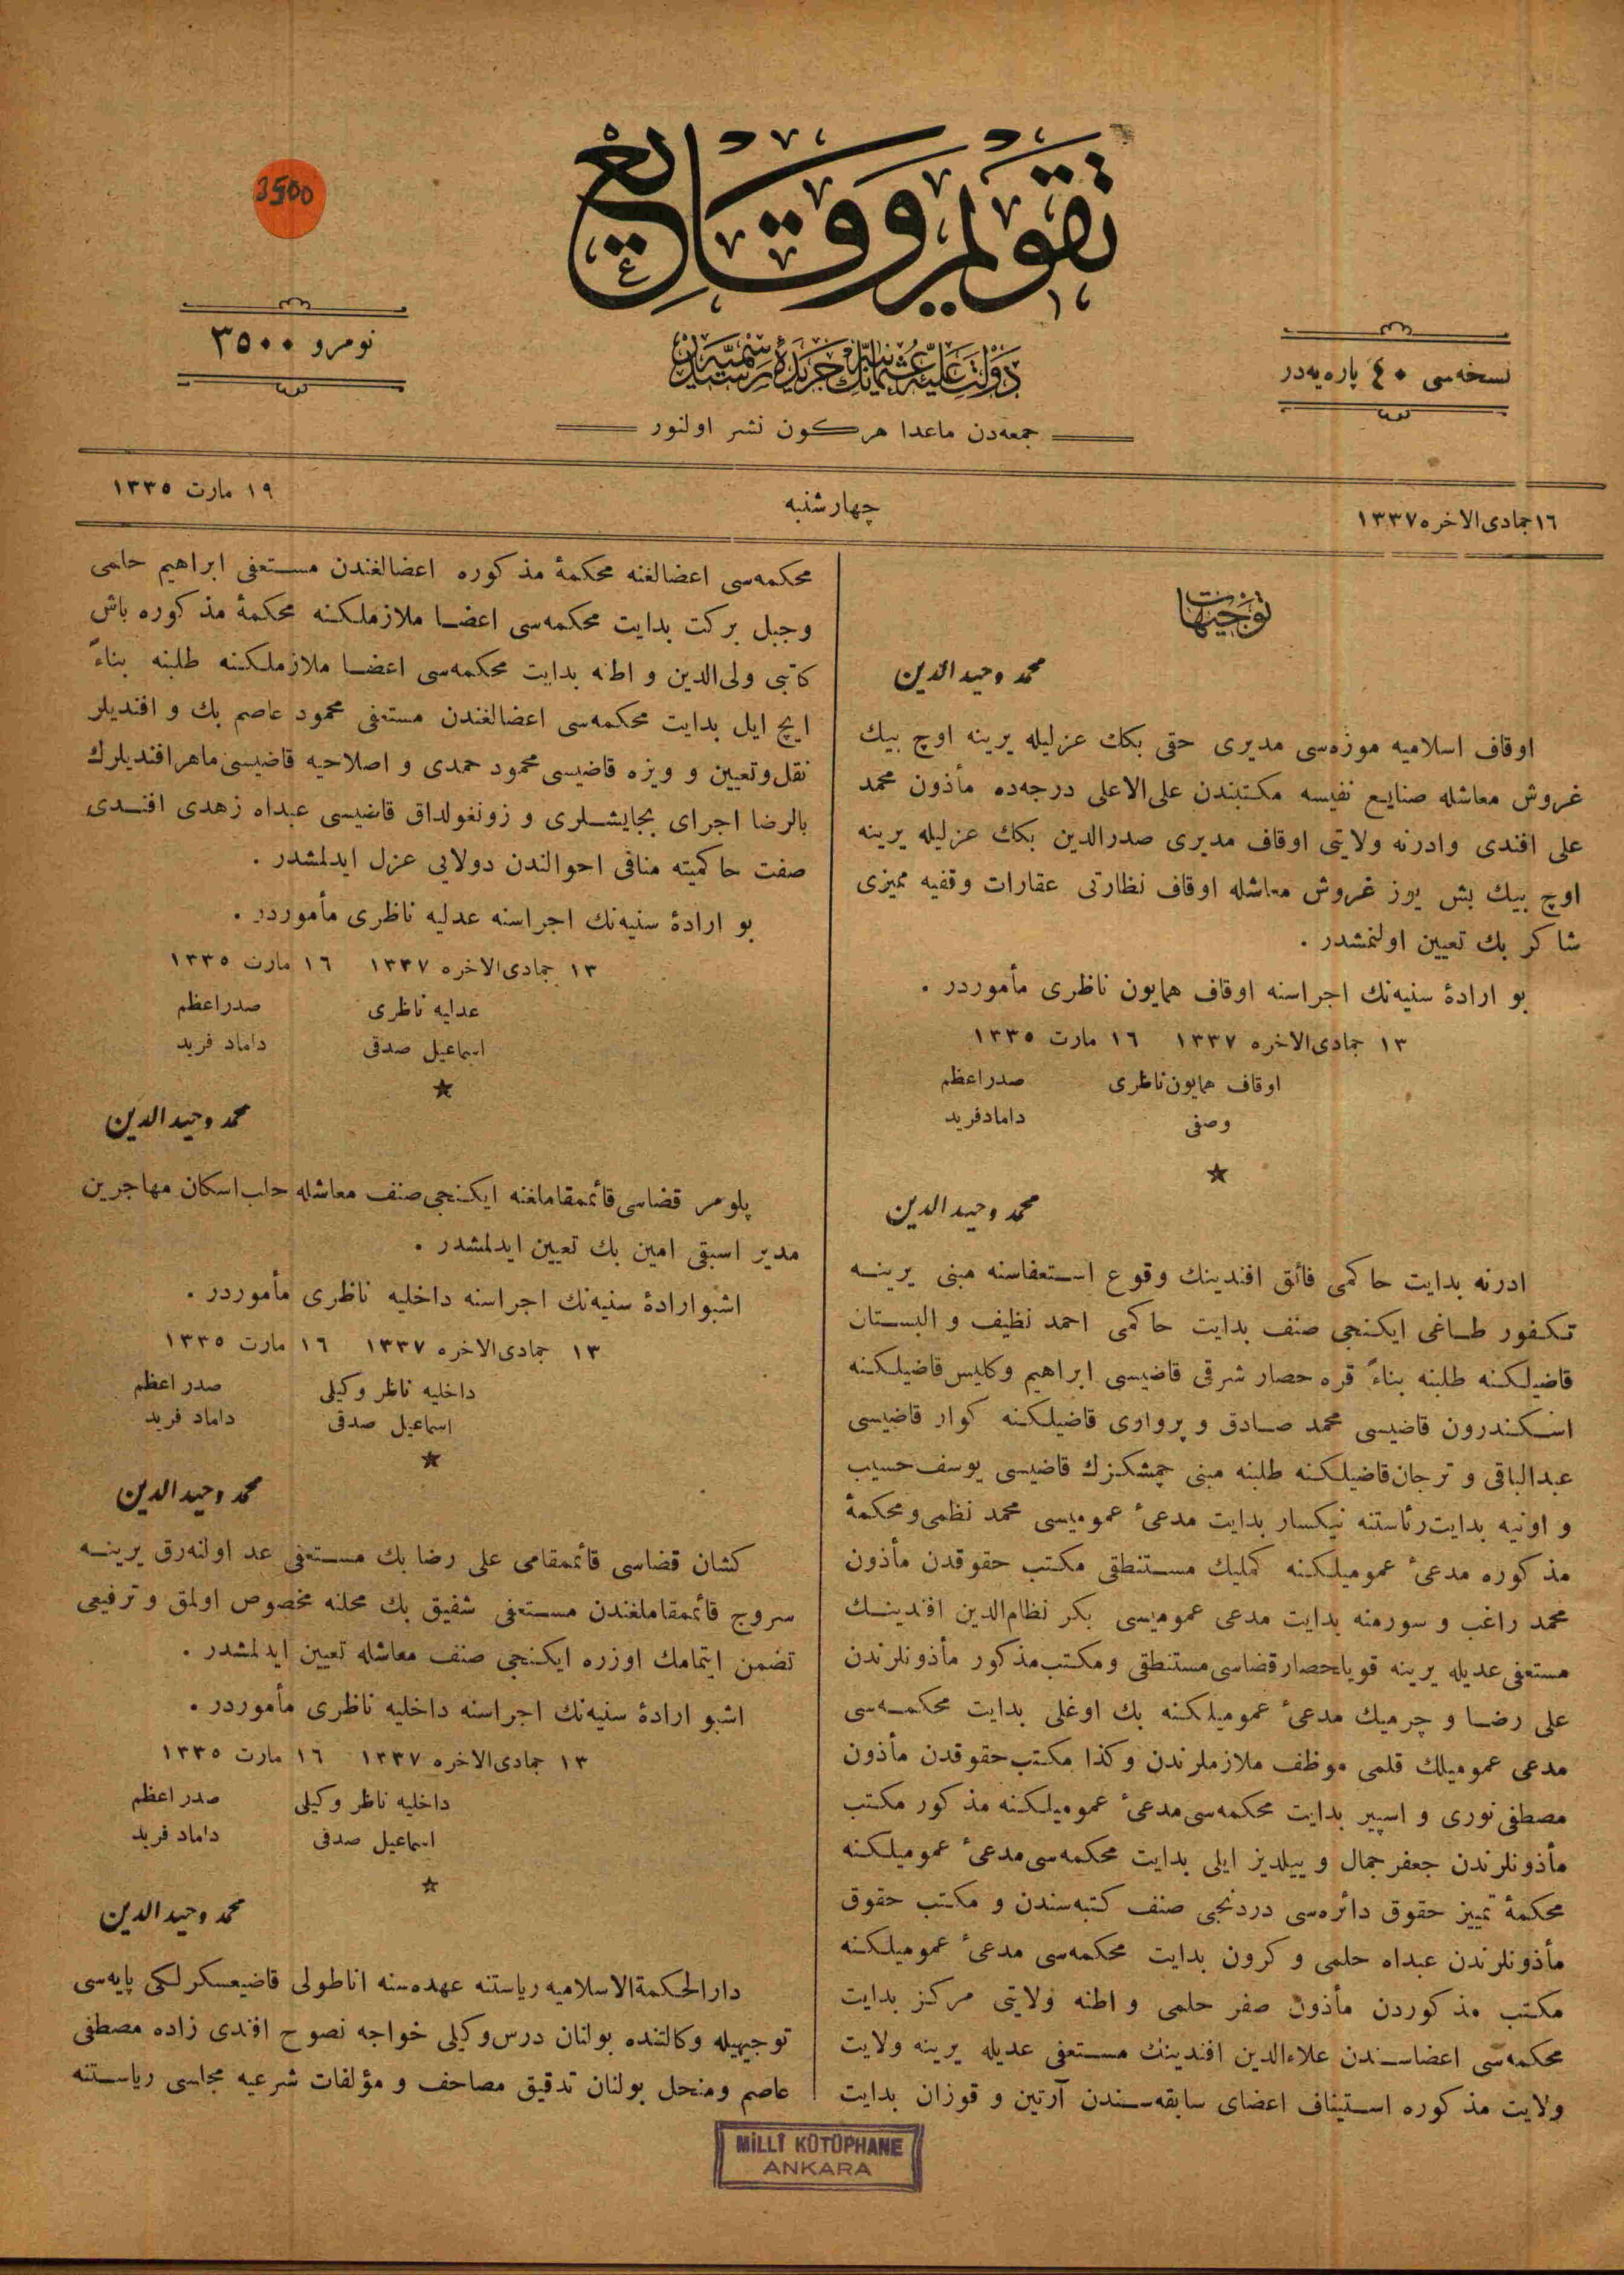 19 Mart 1919 Tarihli Takvim-i Vekayi Gazetesi Sayfa 1